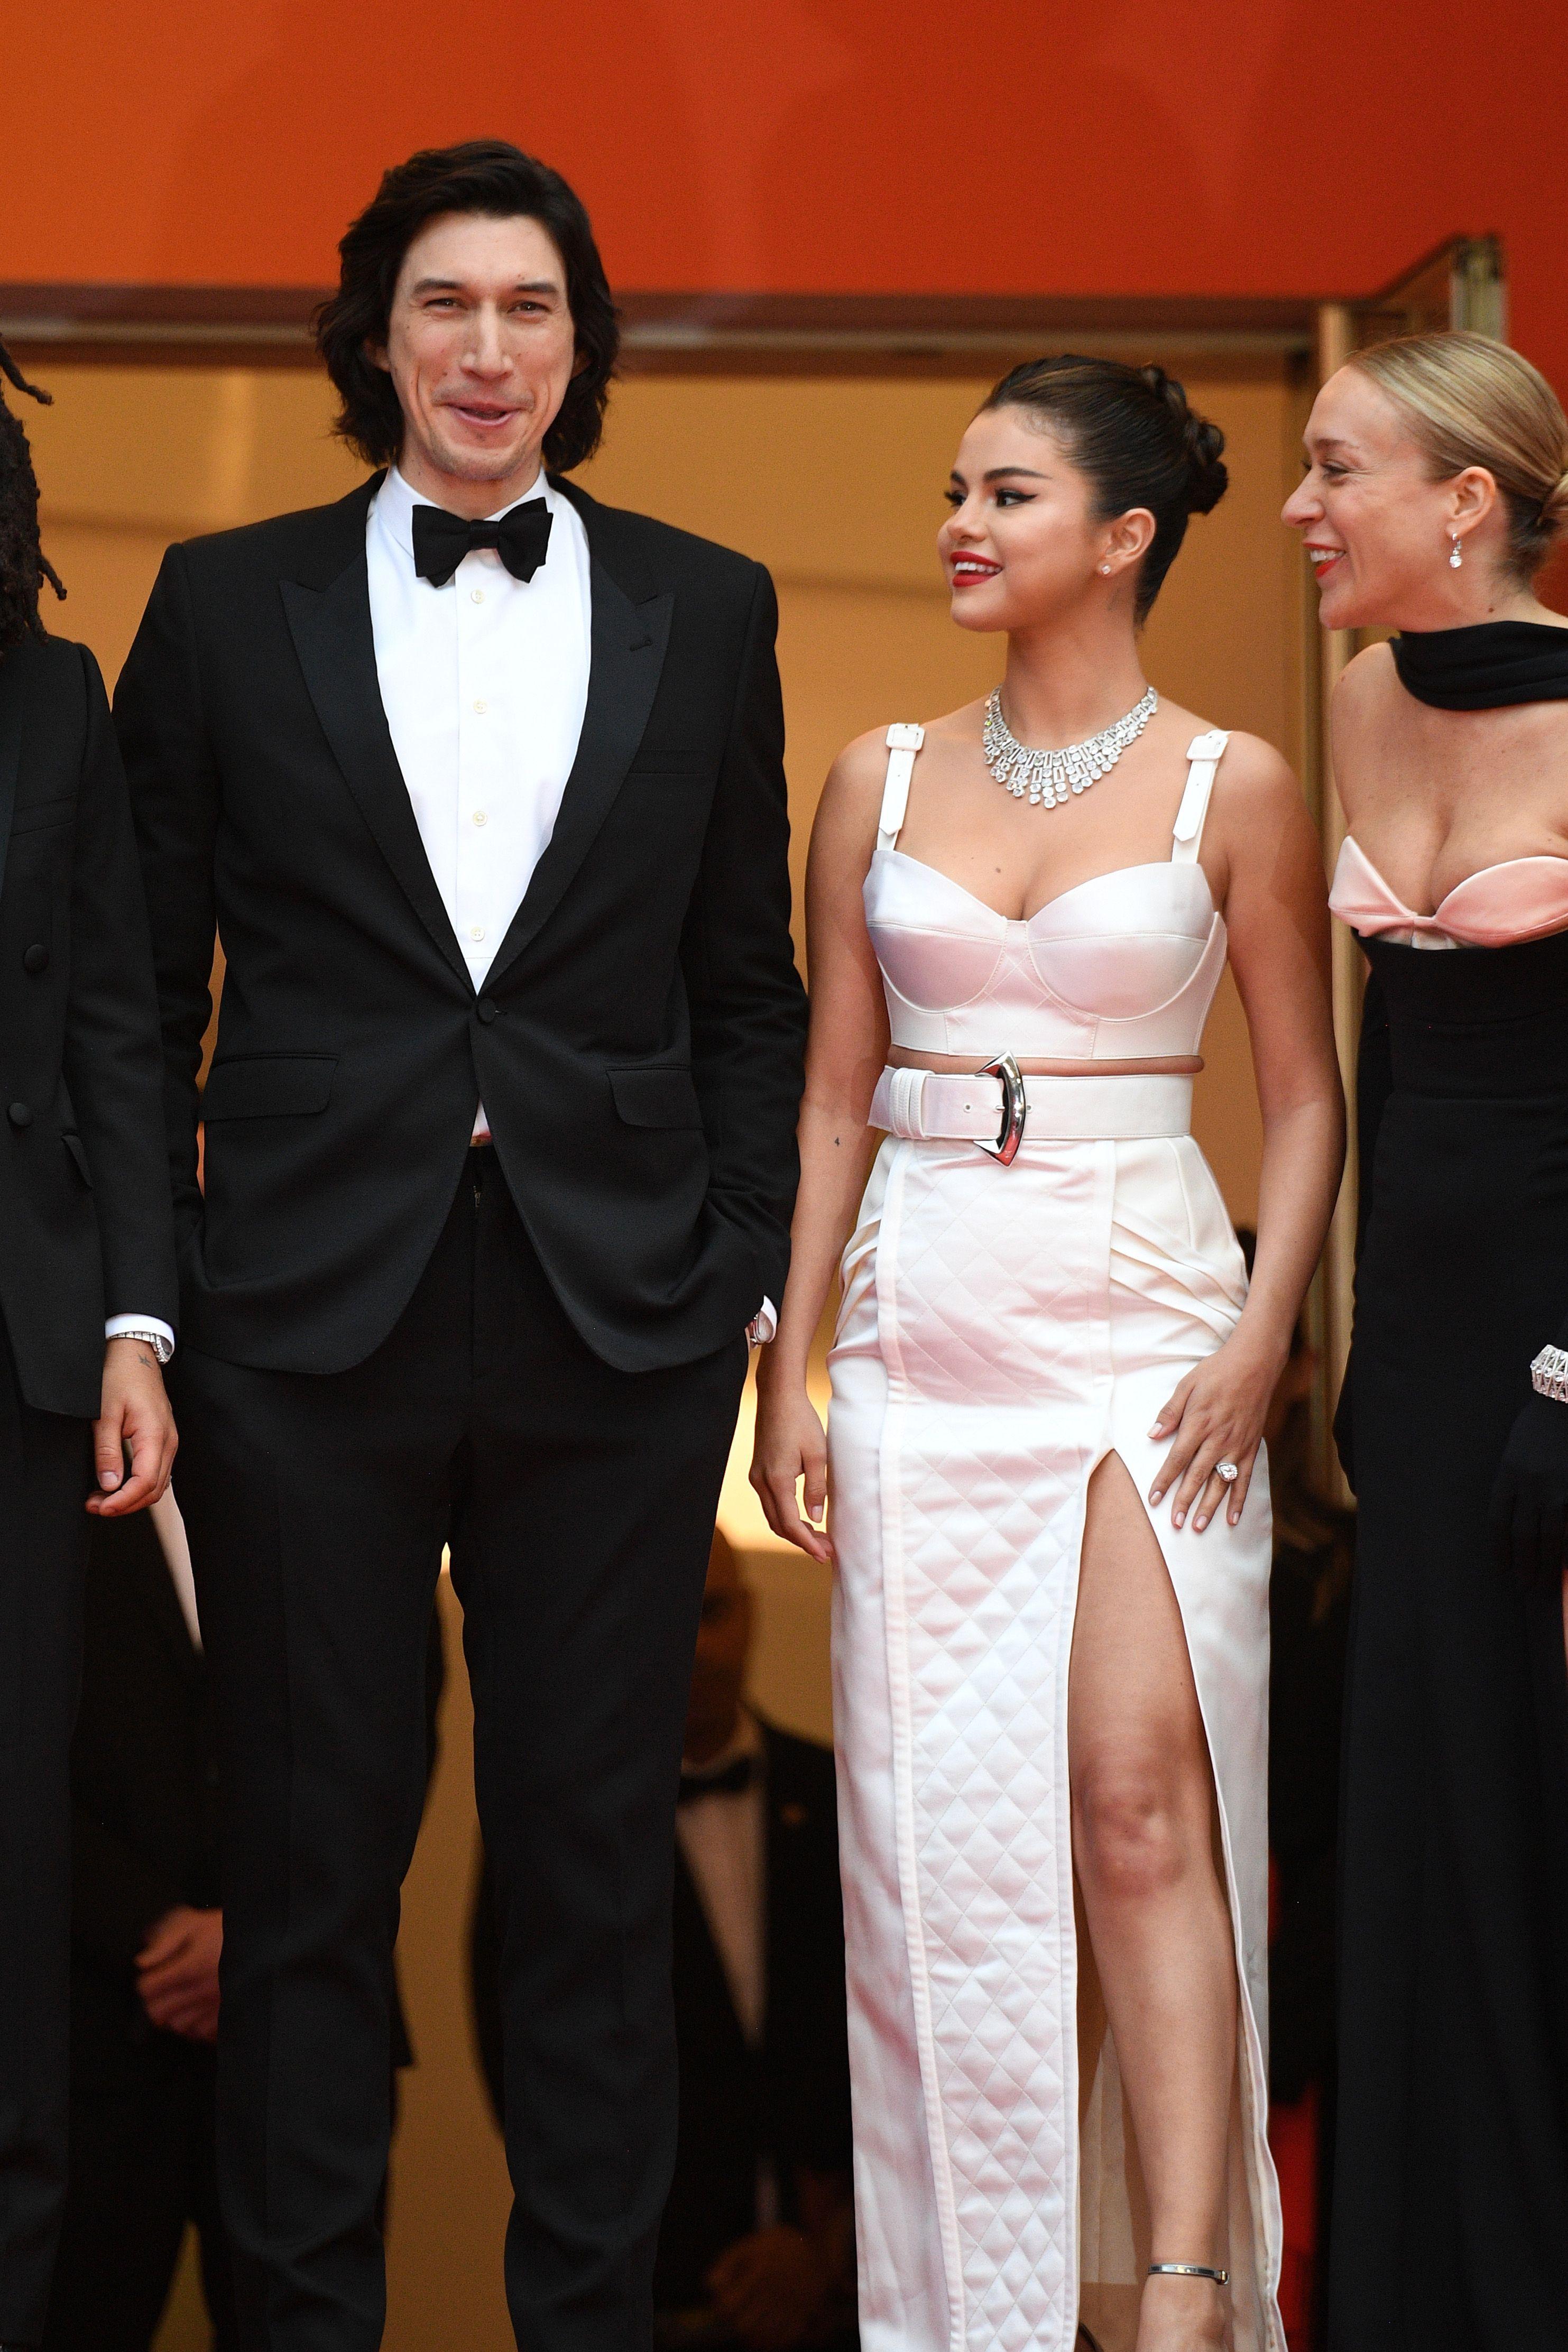 Adam Driver, Selena Gomez, and Chloe Sevigny